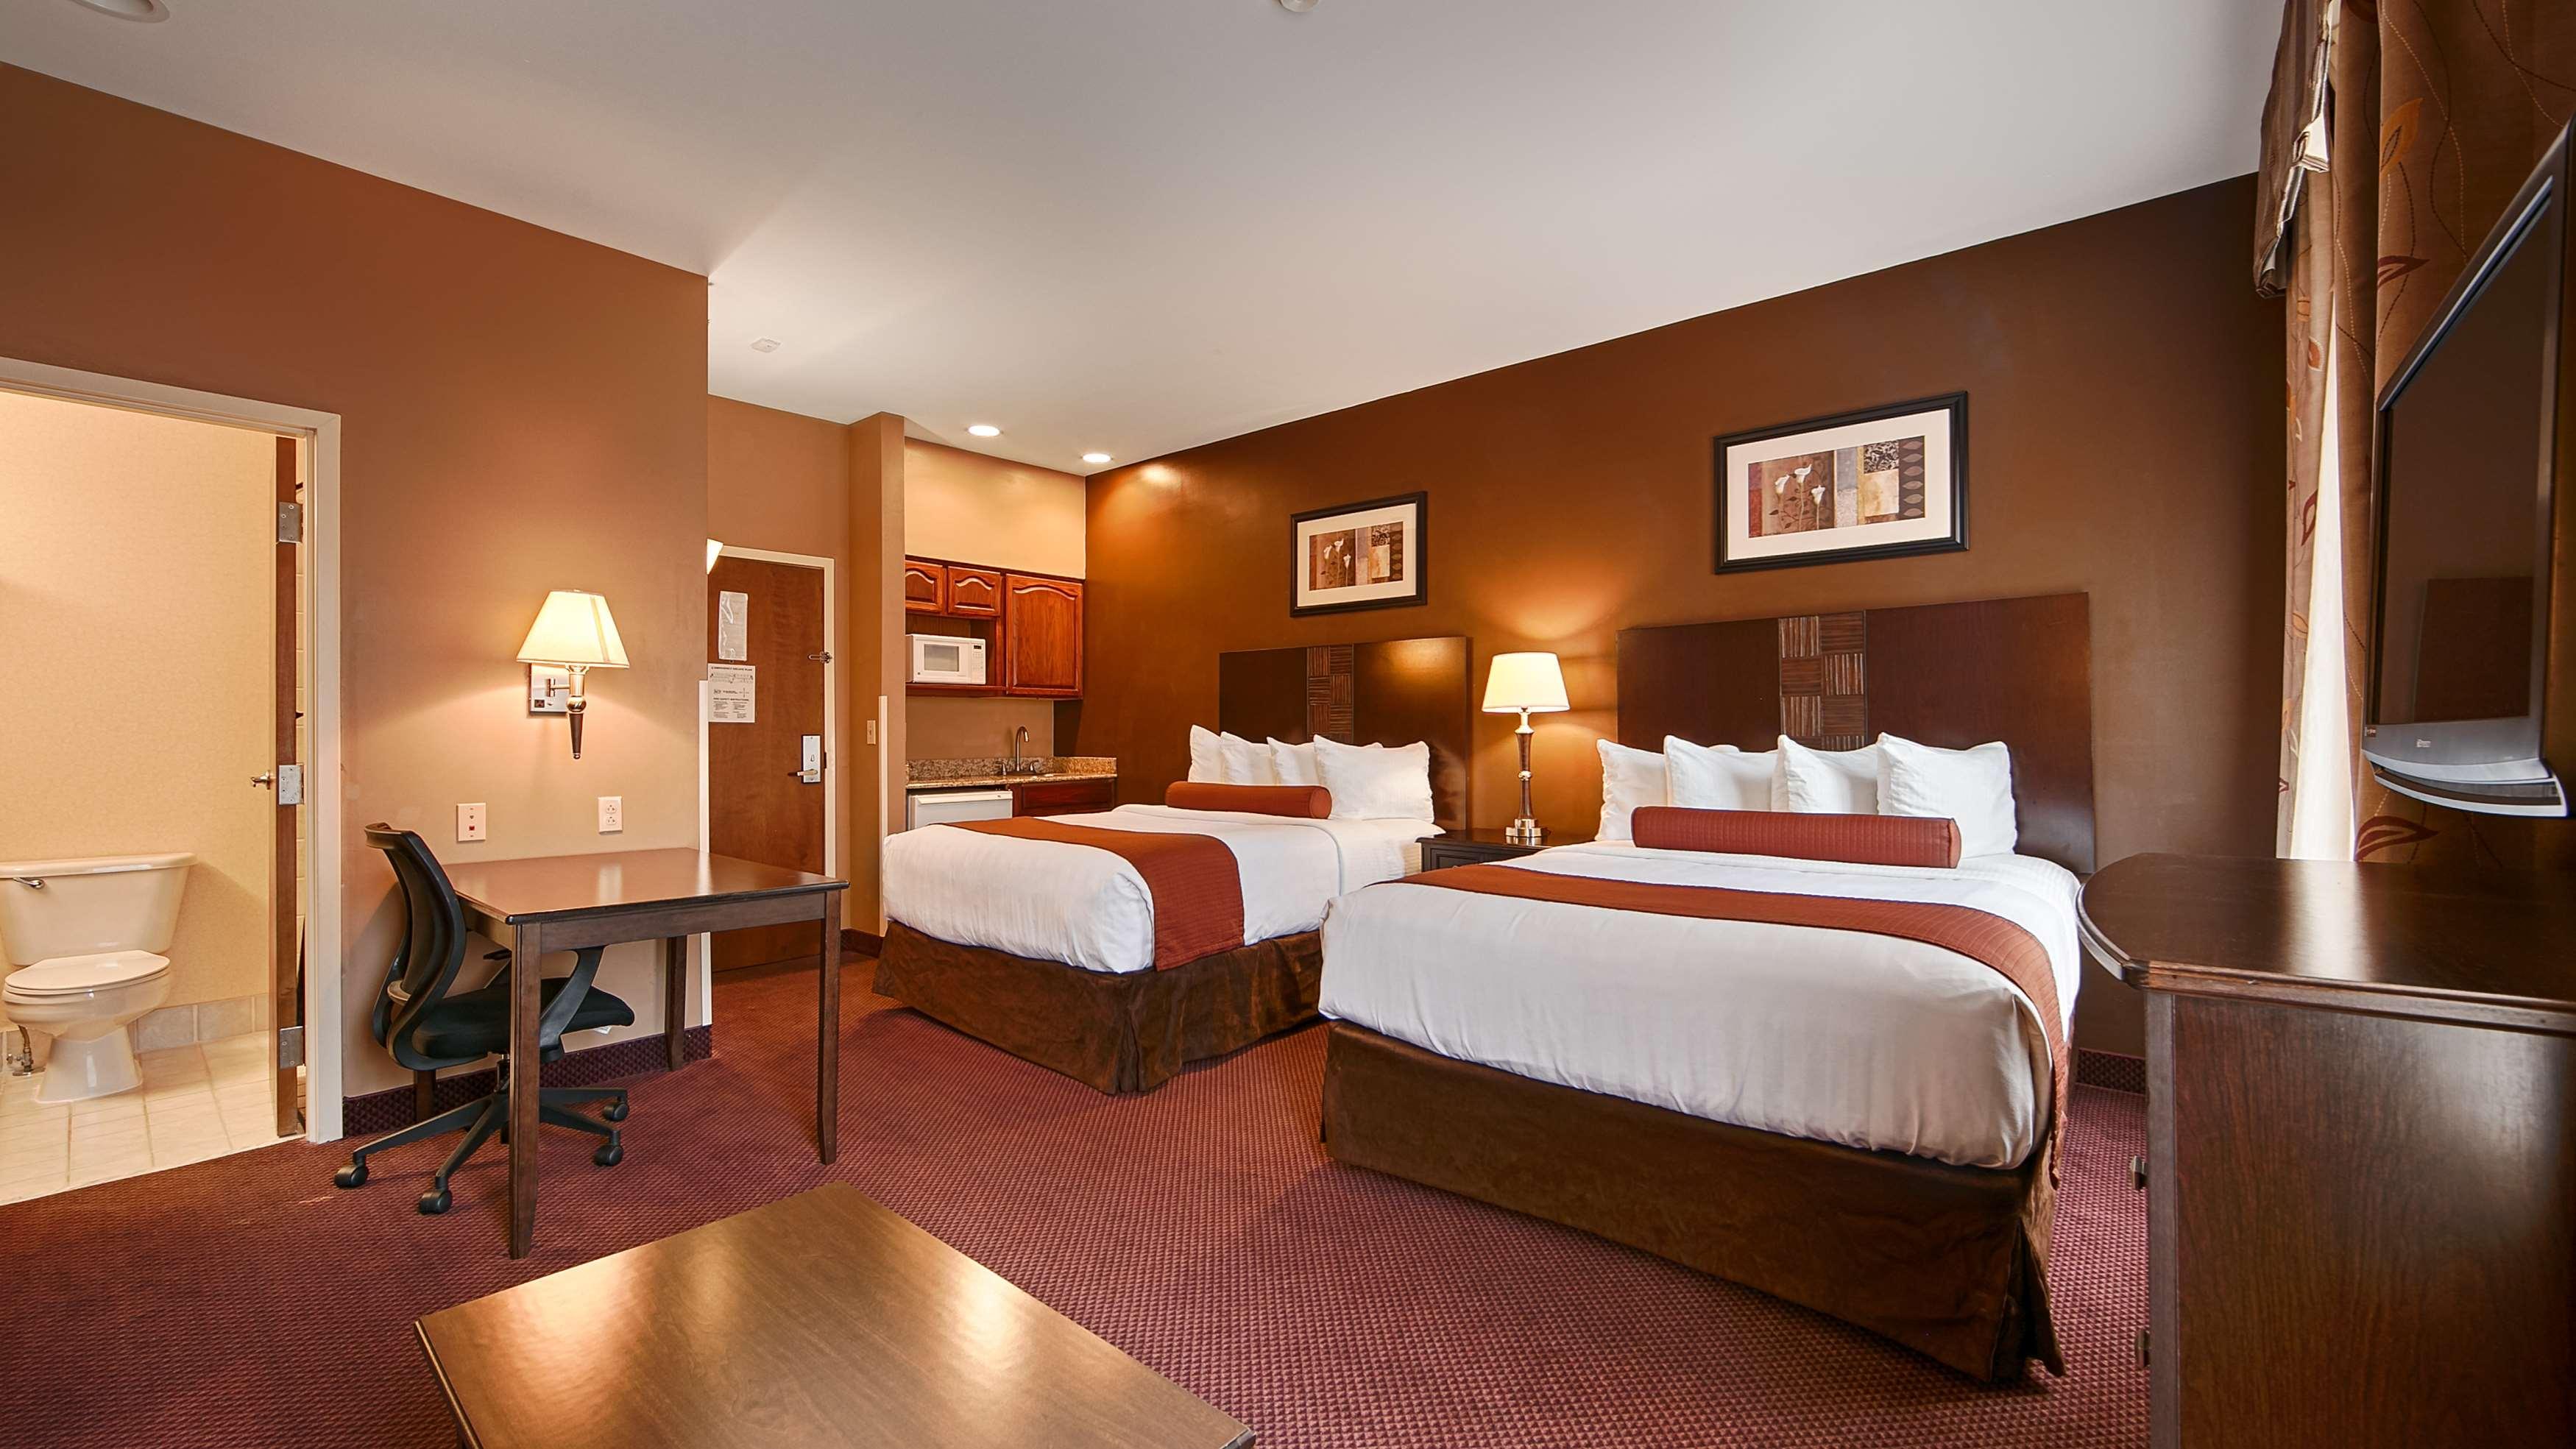 Best Western Plus Hannaford Inn & Suites image 15